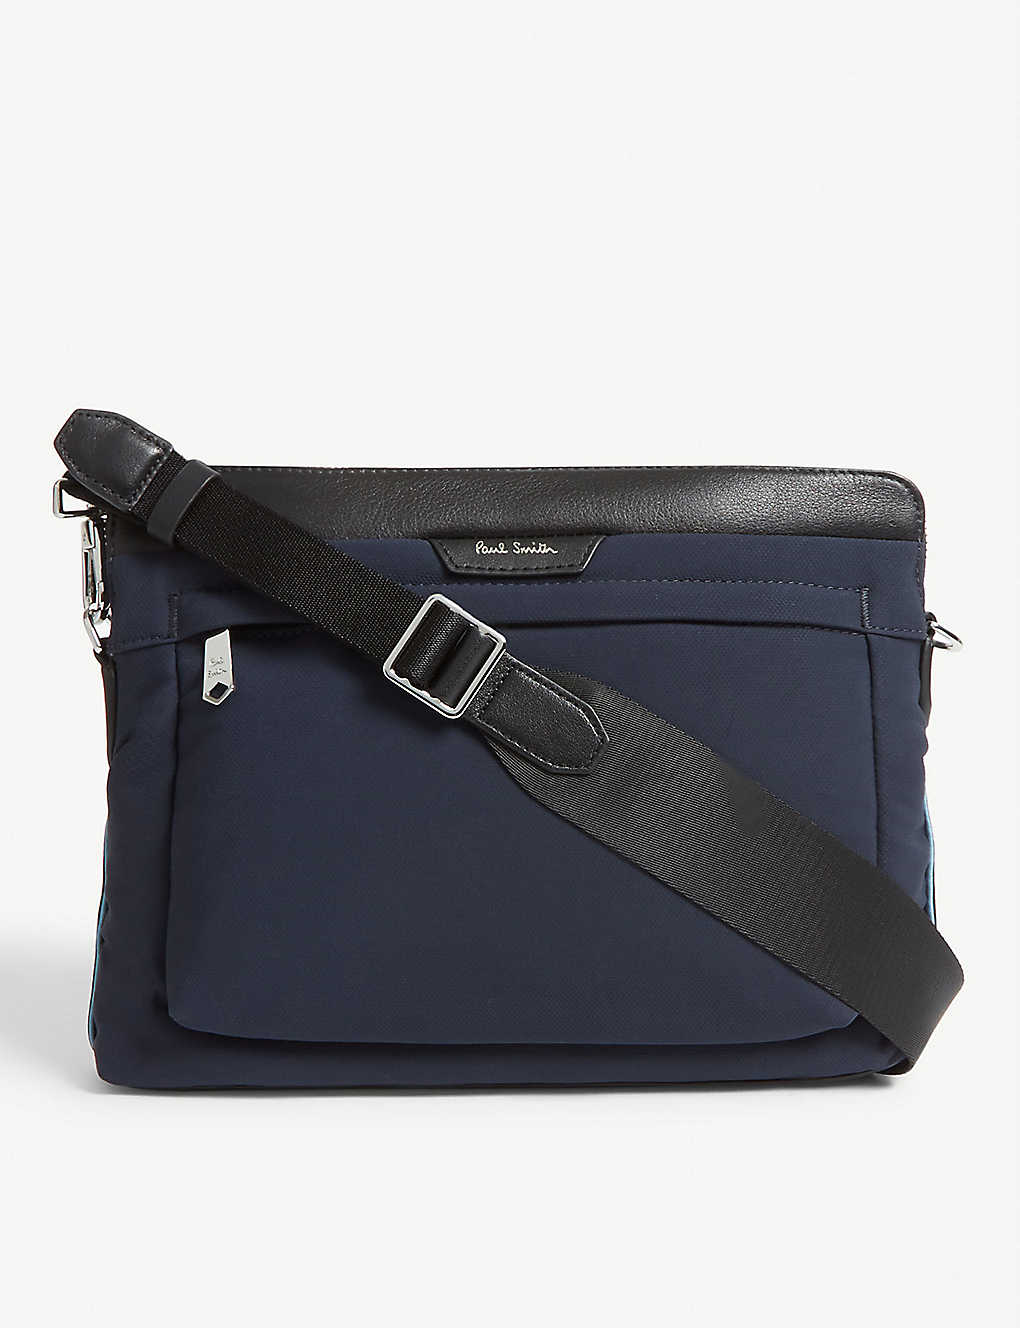 4fa4a933f PAUL SMITH ACCESSORIES - Leather-trimmed nylon cross-body bag ...